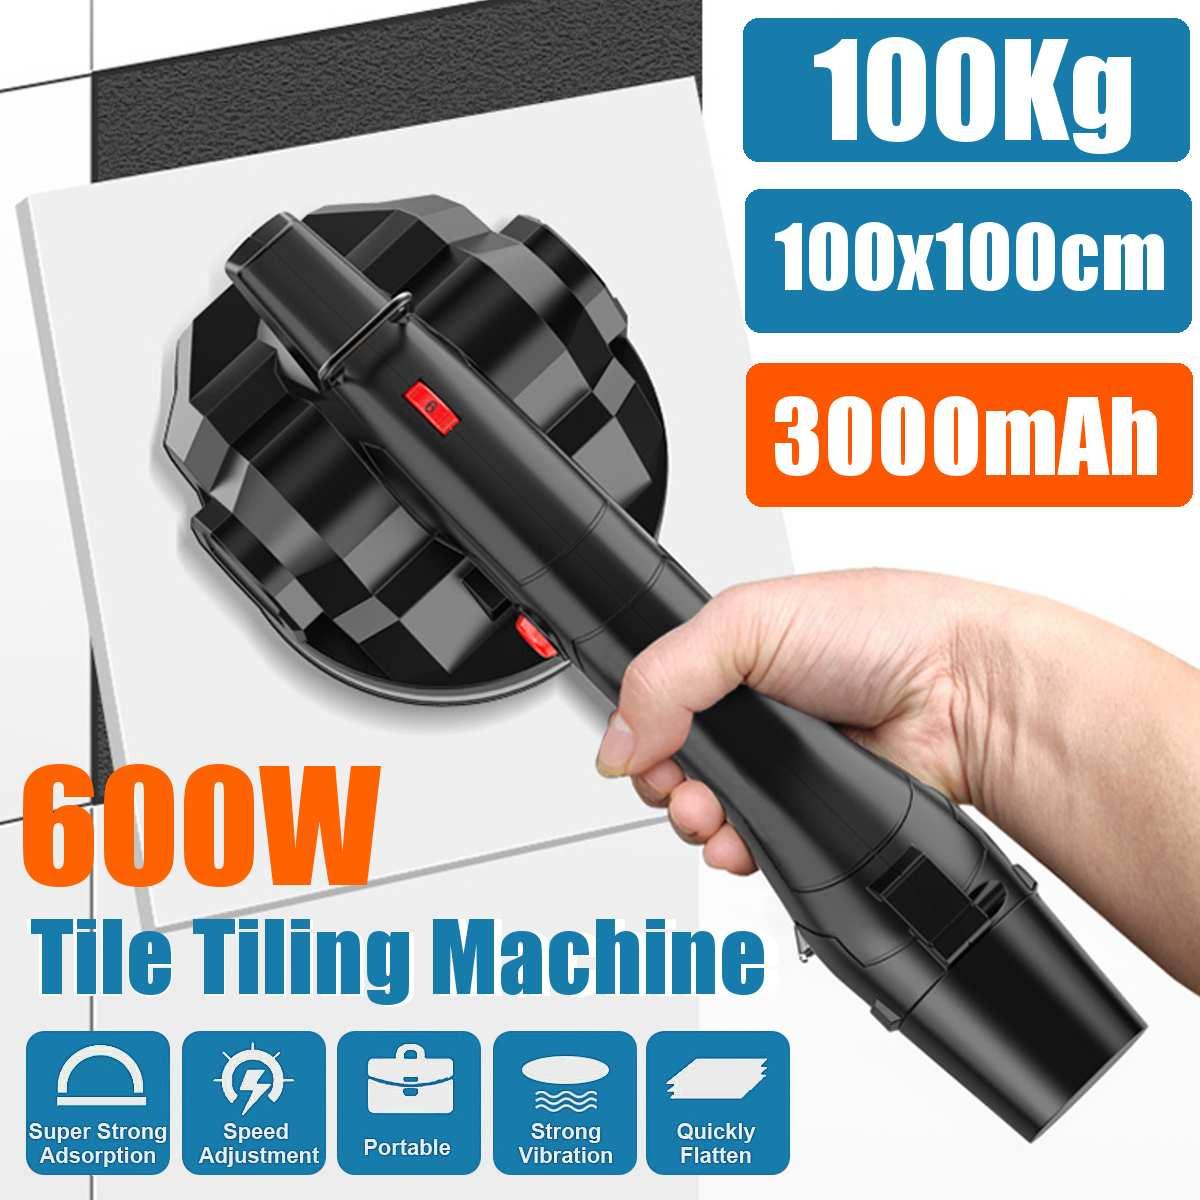 Tile Tilling Vibrator For Tiles 100x100cm Tiling Plastering Machine Laying Tiles+battery Automatic Floor Vibrator Leveling Tool